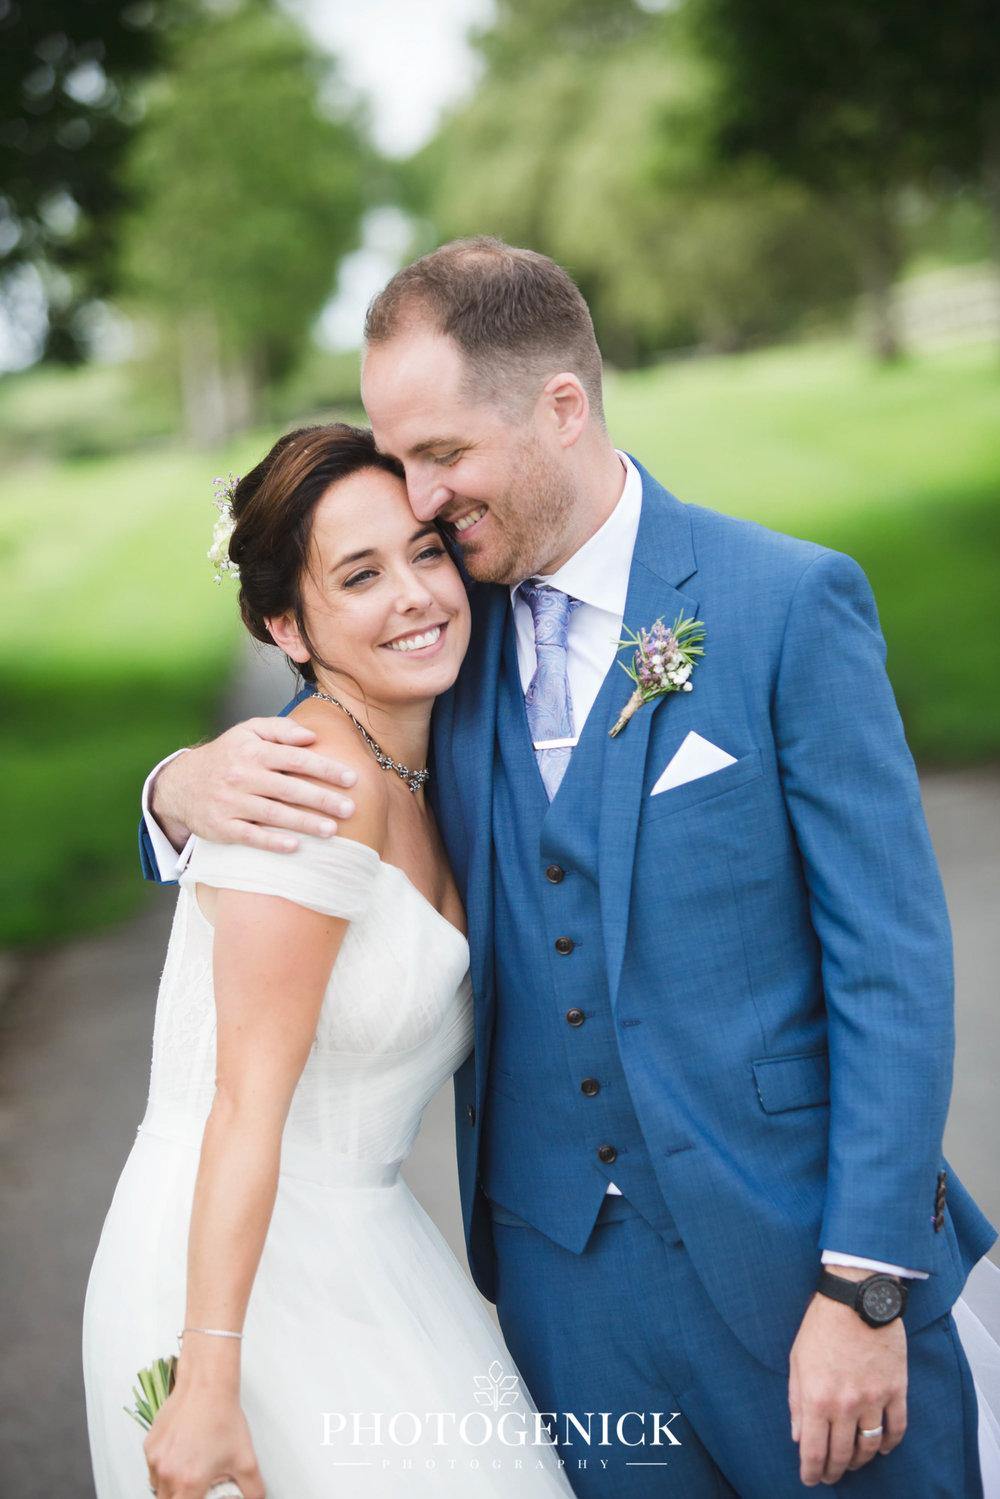 oldwalls gower wedding photographers-44.jpg